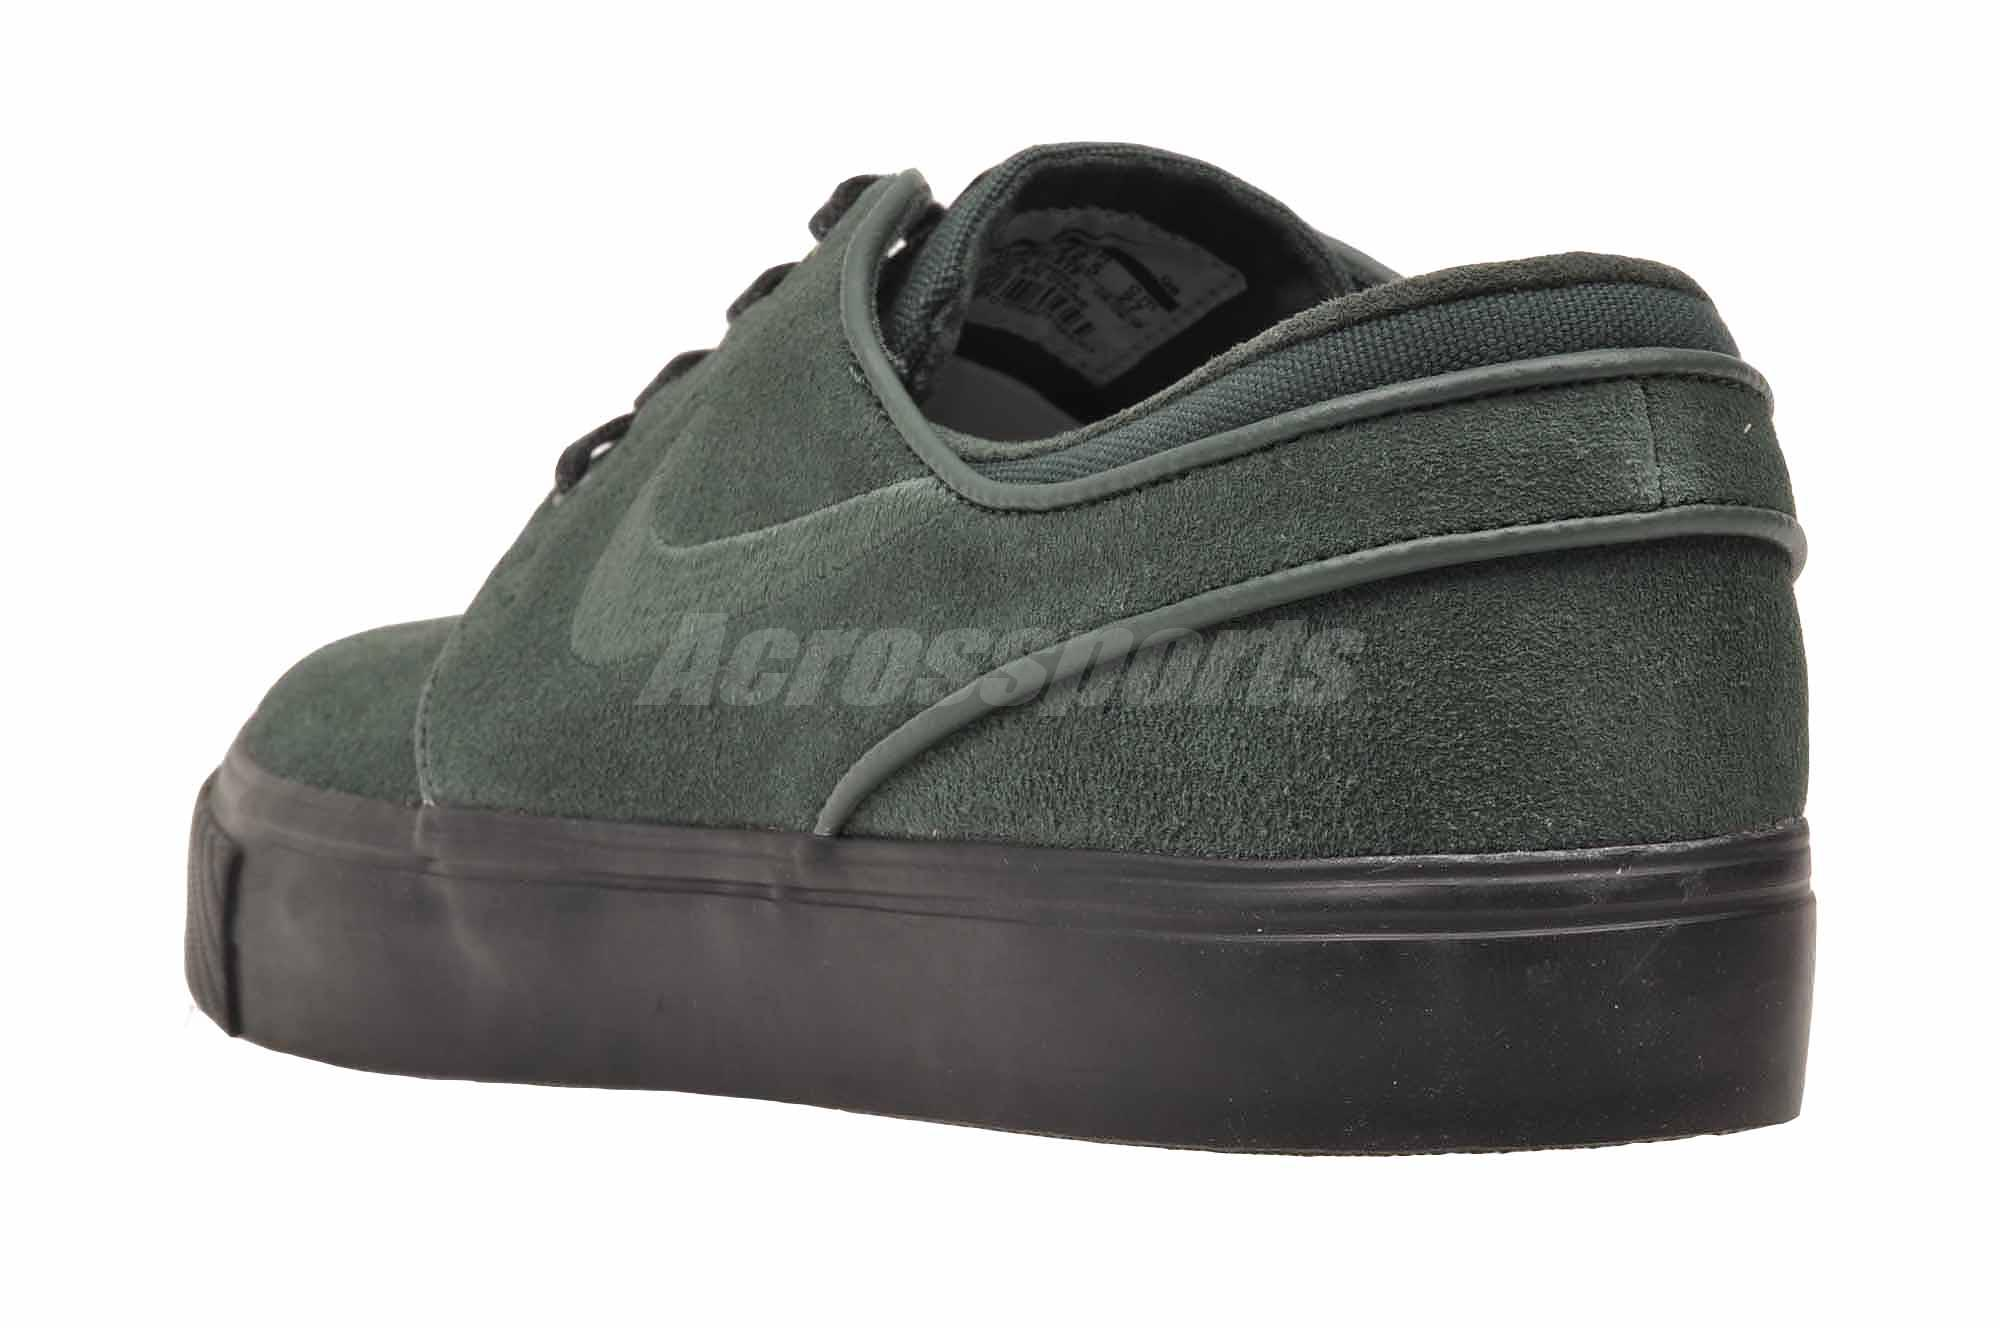 a6e00750ff17f Nike SB Zoom Stefan Janoski Sneakers Midnight Green Lifestyle Shoes 333824- 312